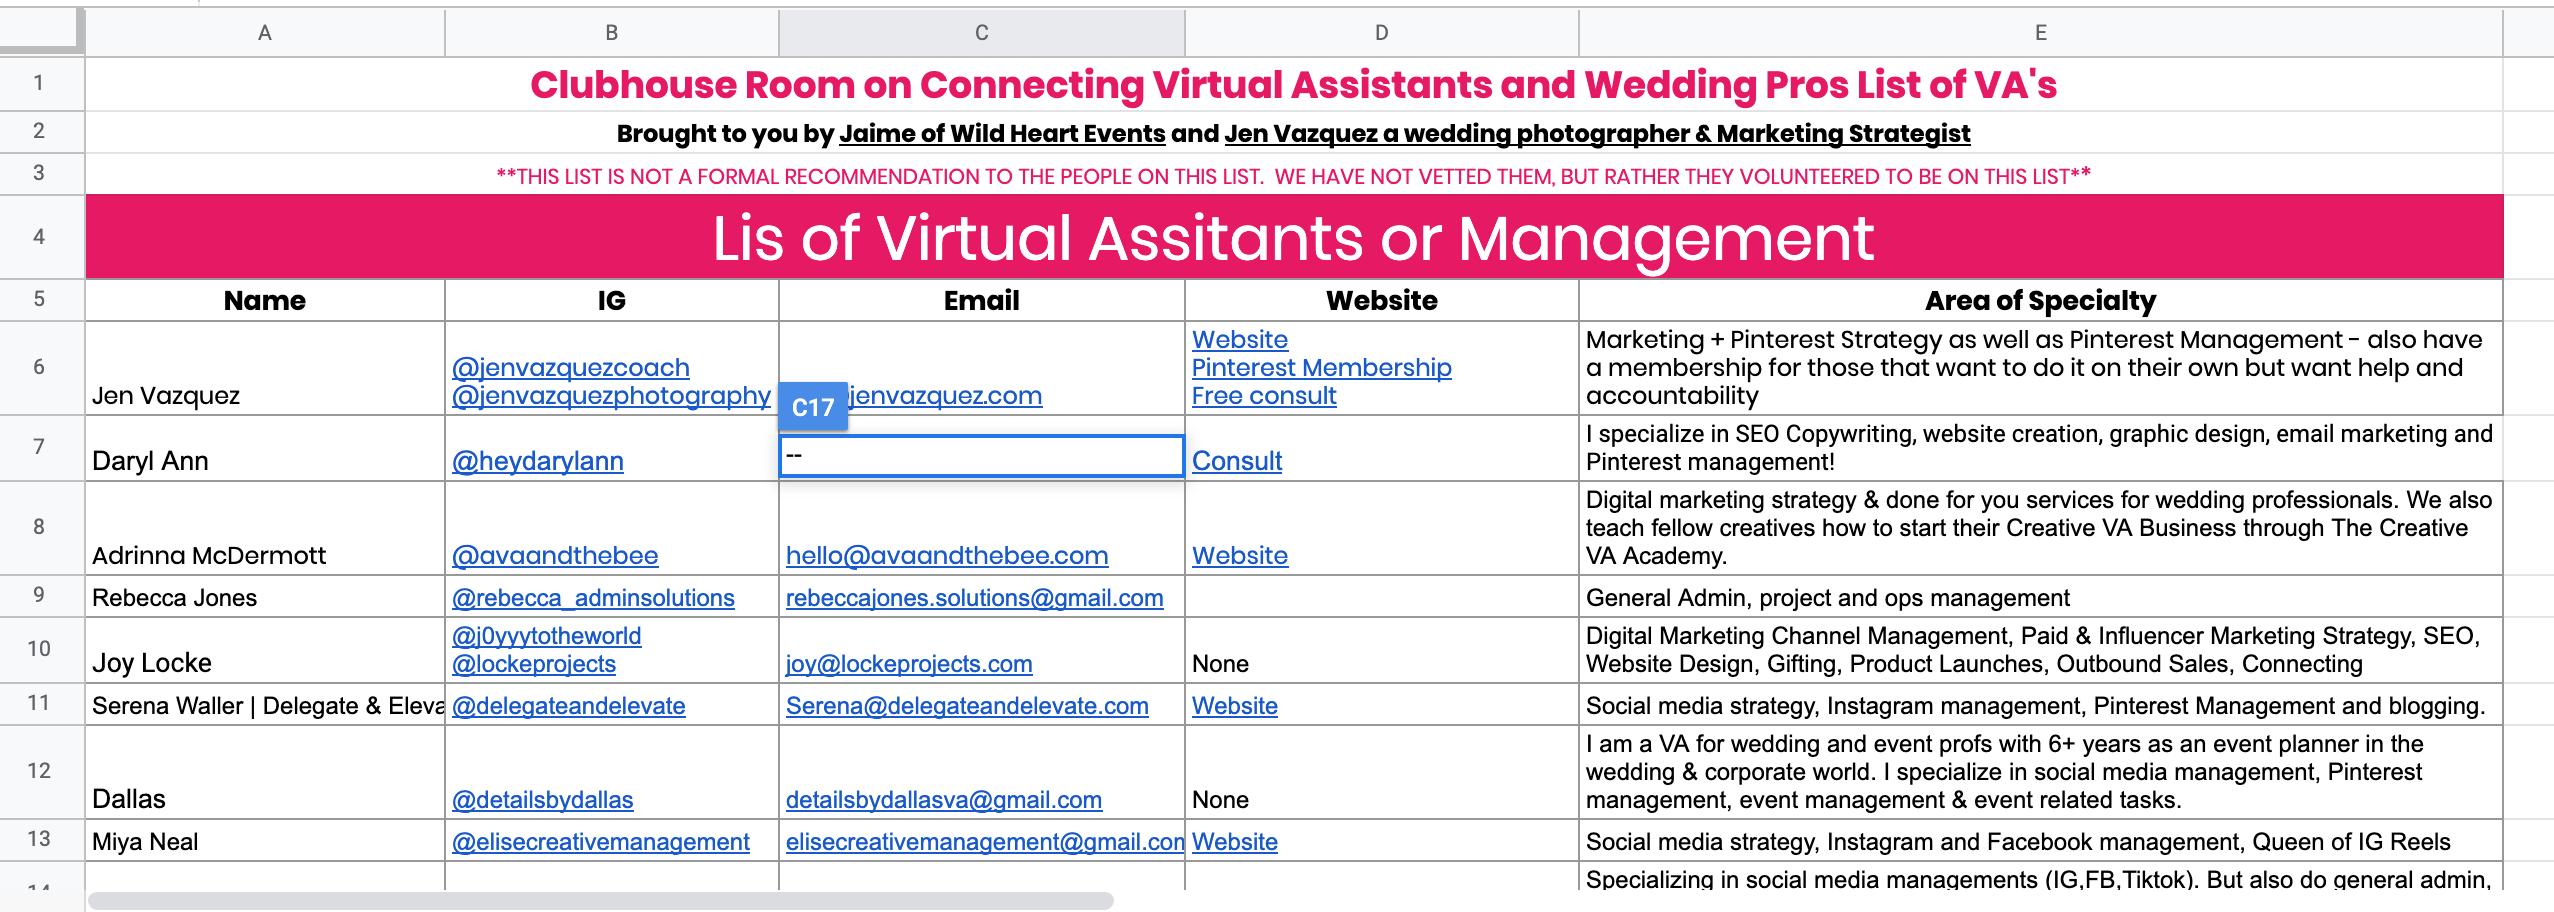 Screen Shot of VA's and Management companies